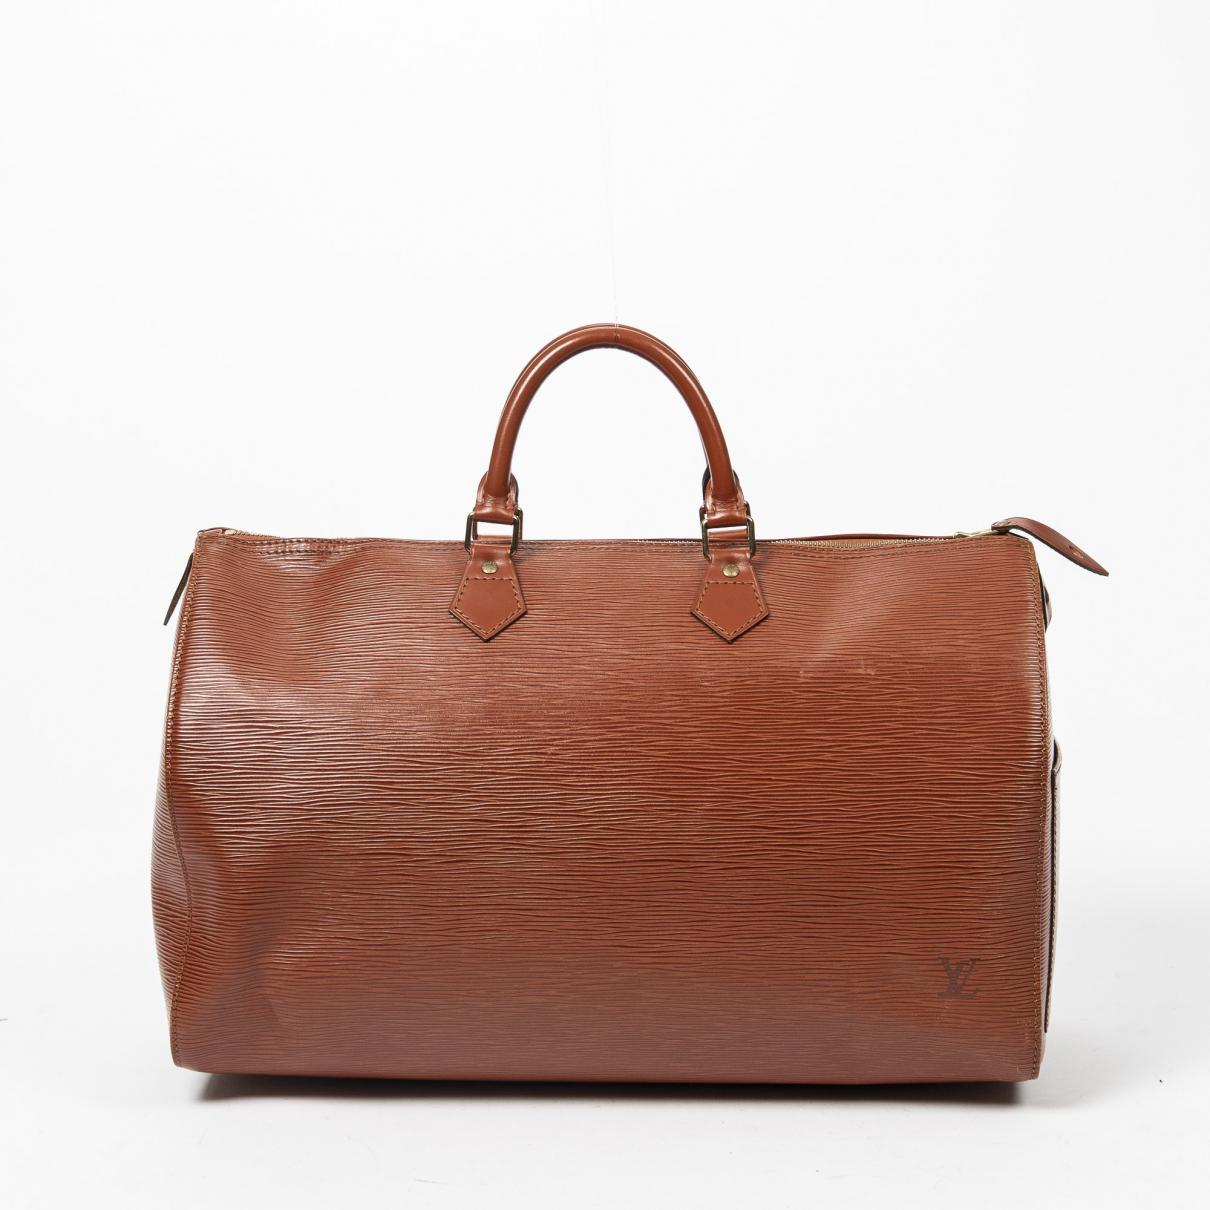 Louis Vuitton \N Reisetasche in  Khaki Leder